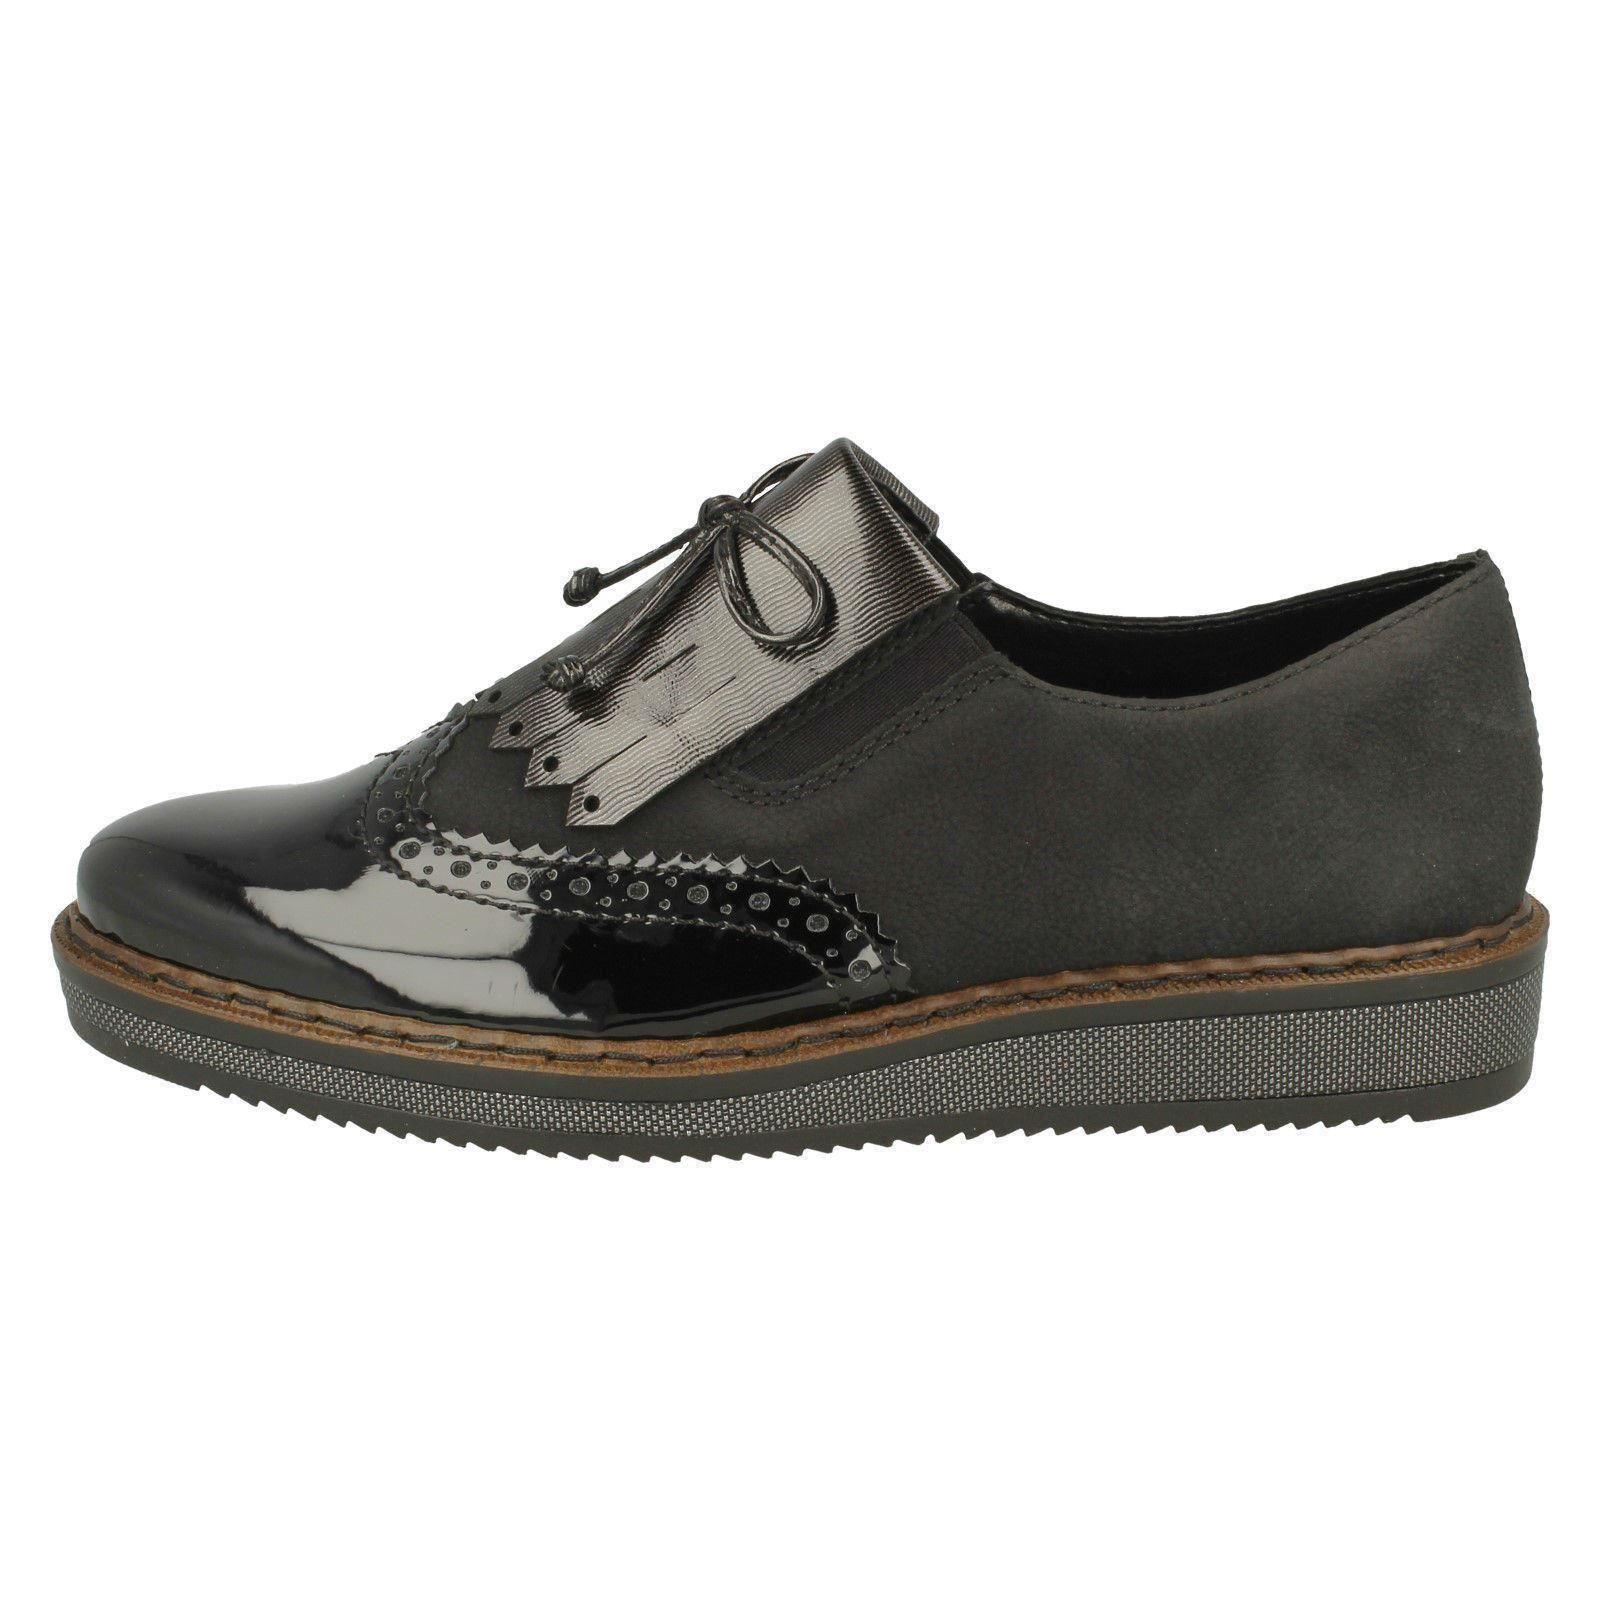 Chaussures N0372 Détails Mocassins Femmes Inspiré Sur Rieker Yf7vgyb6